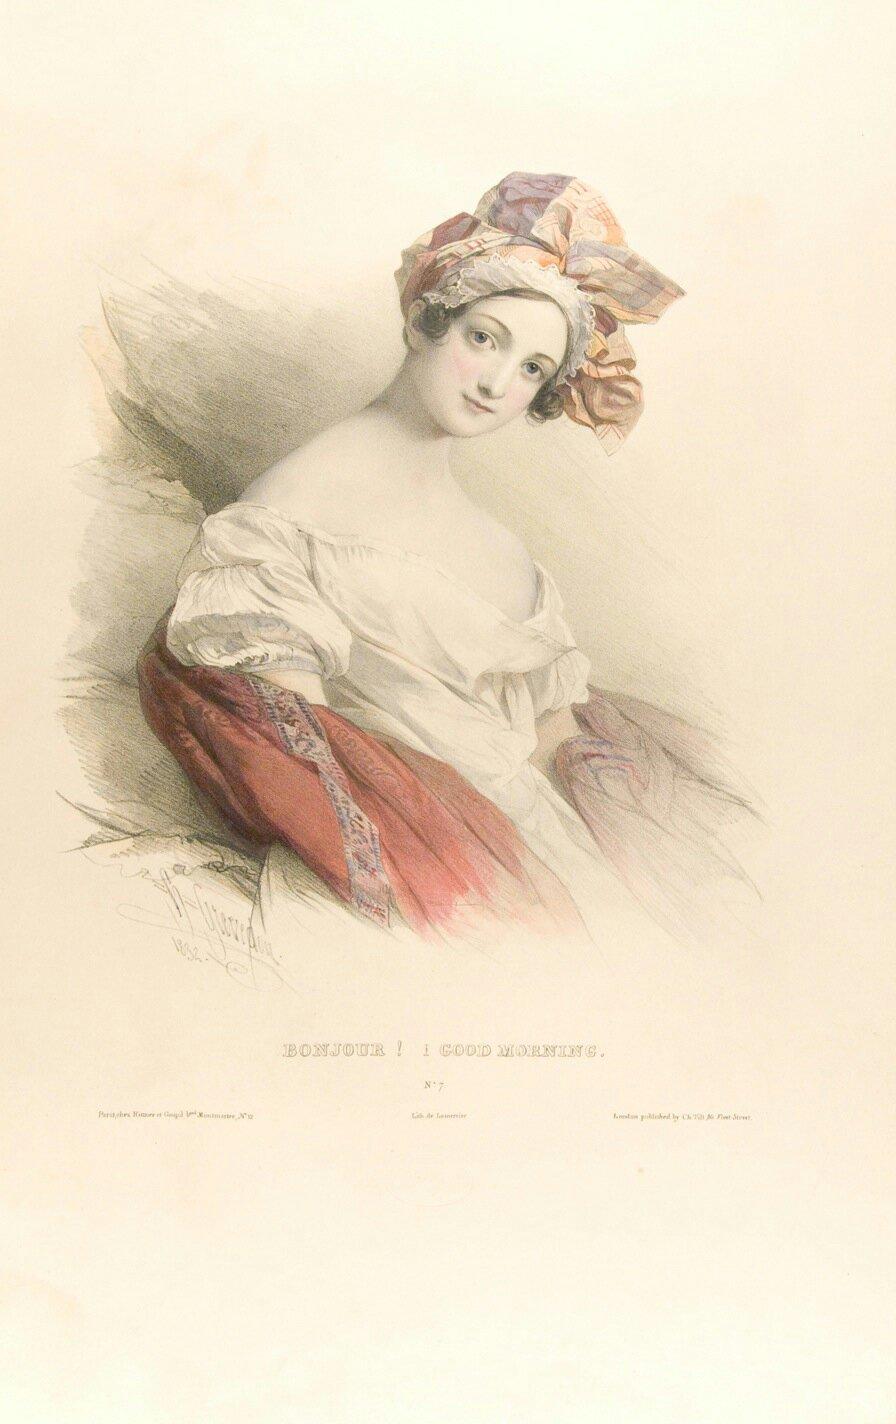 17-grevedon-vocabulaire-des-dames-1832-no-7-good-morning-clark-tiff-1286003347.jpg